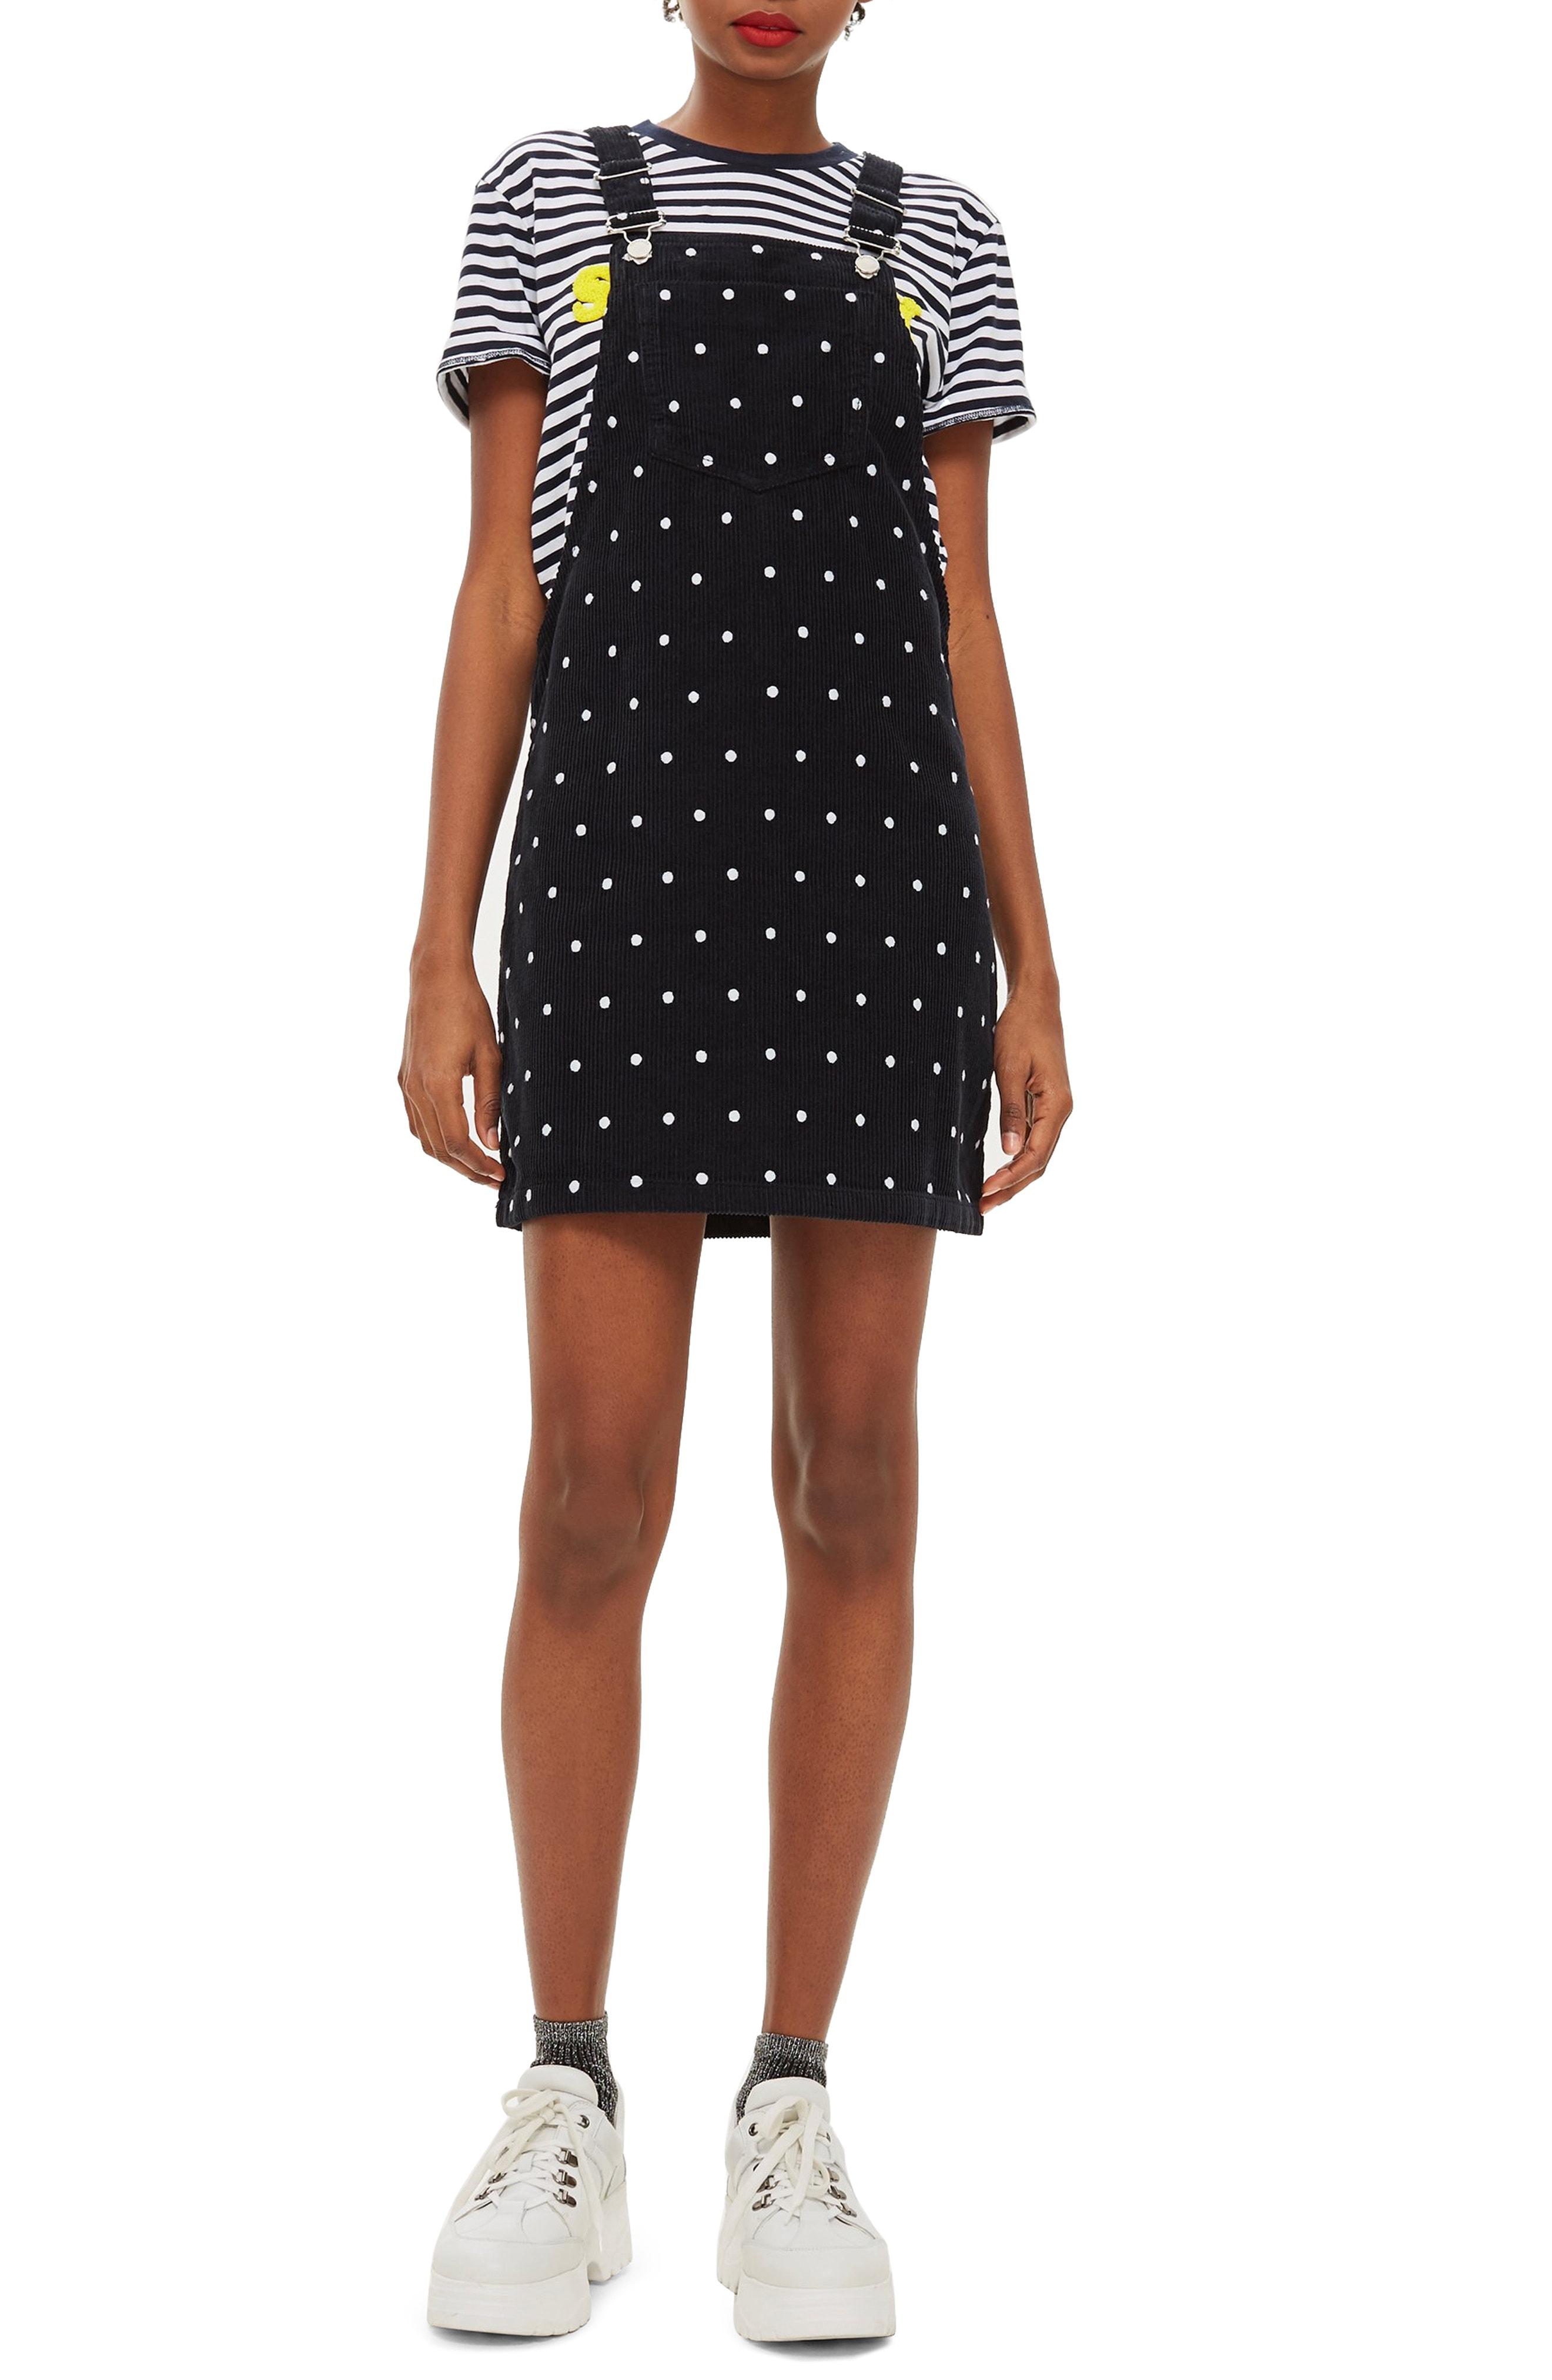 Topshop Polka Dot Corduroy Pinafore Dress